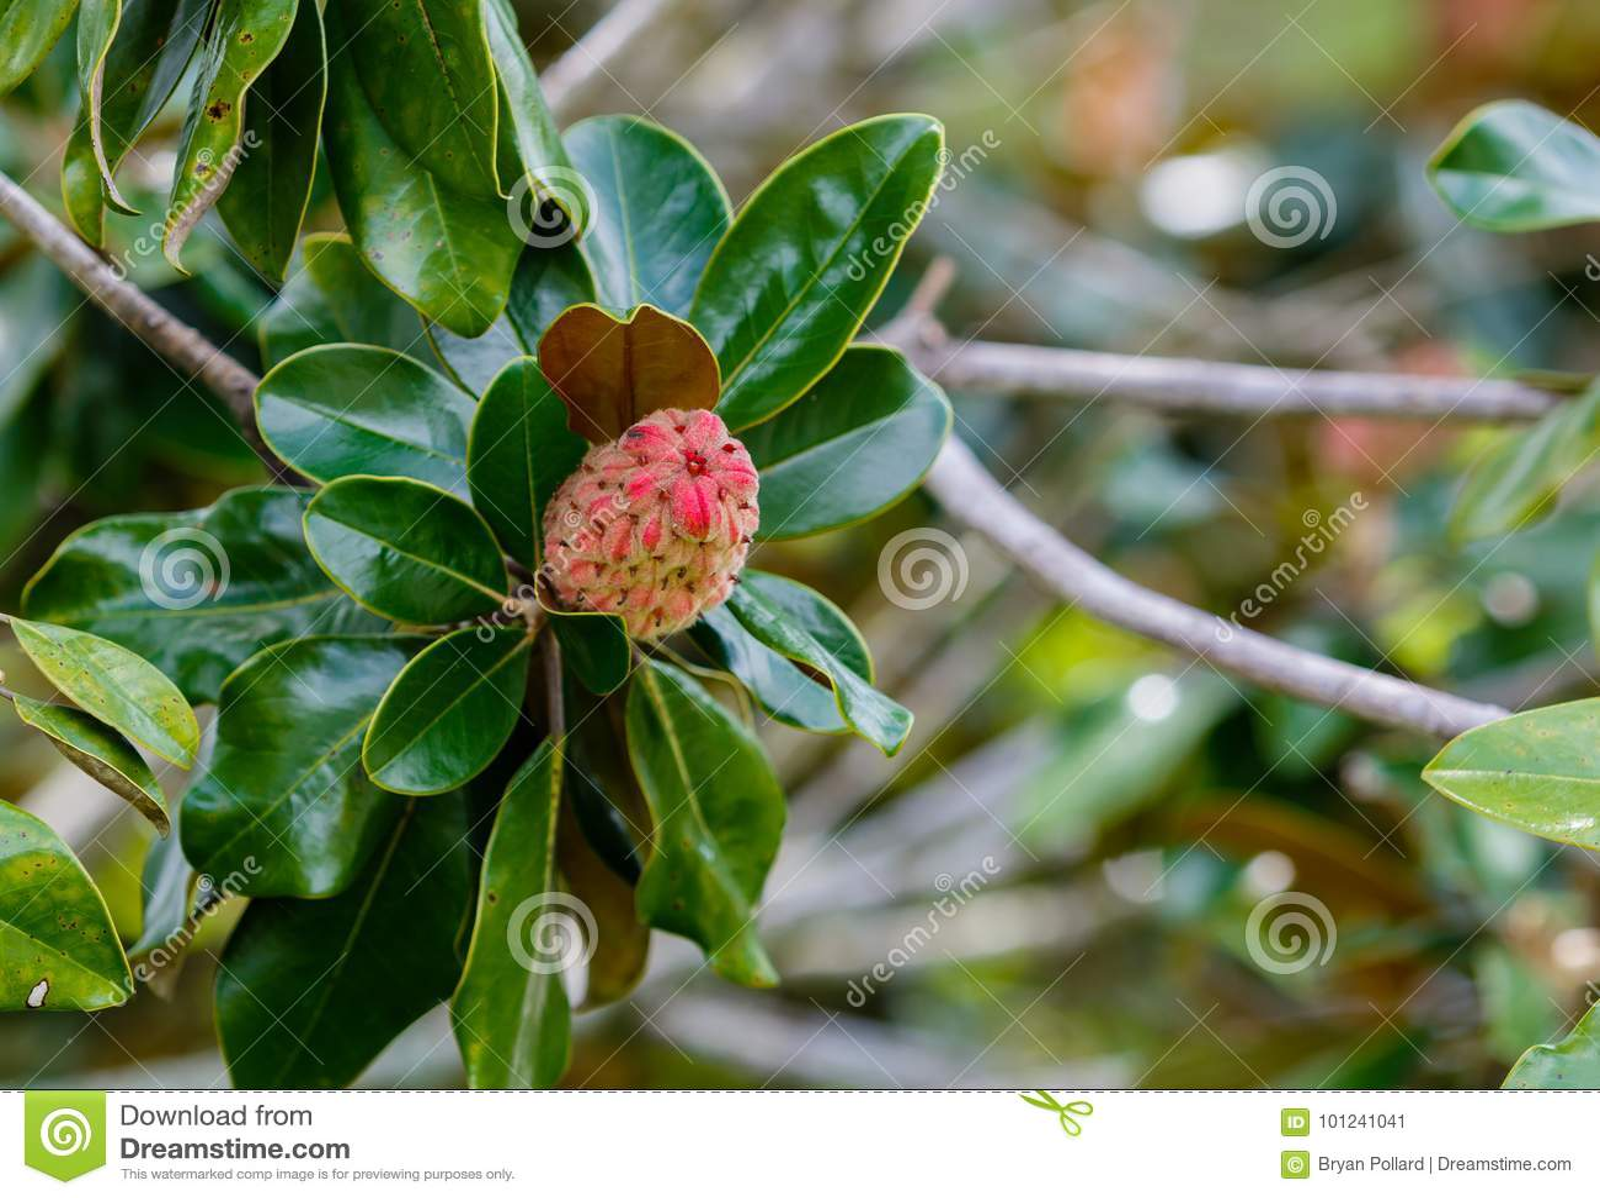 Magnolia Seed Pod Stock Image Image Of Florida Nature 101241041